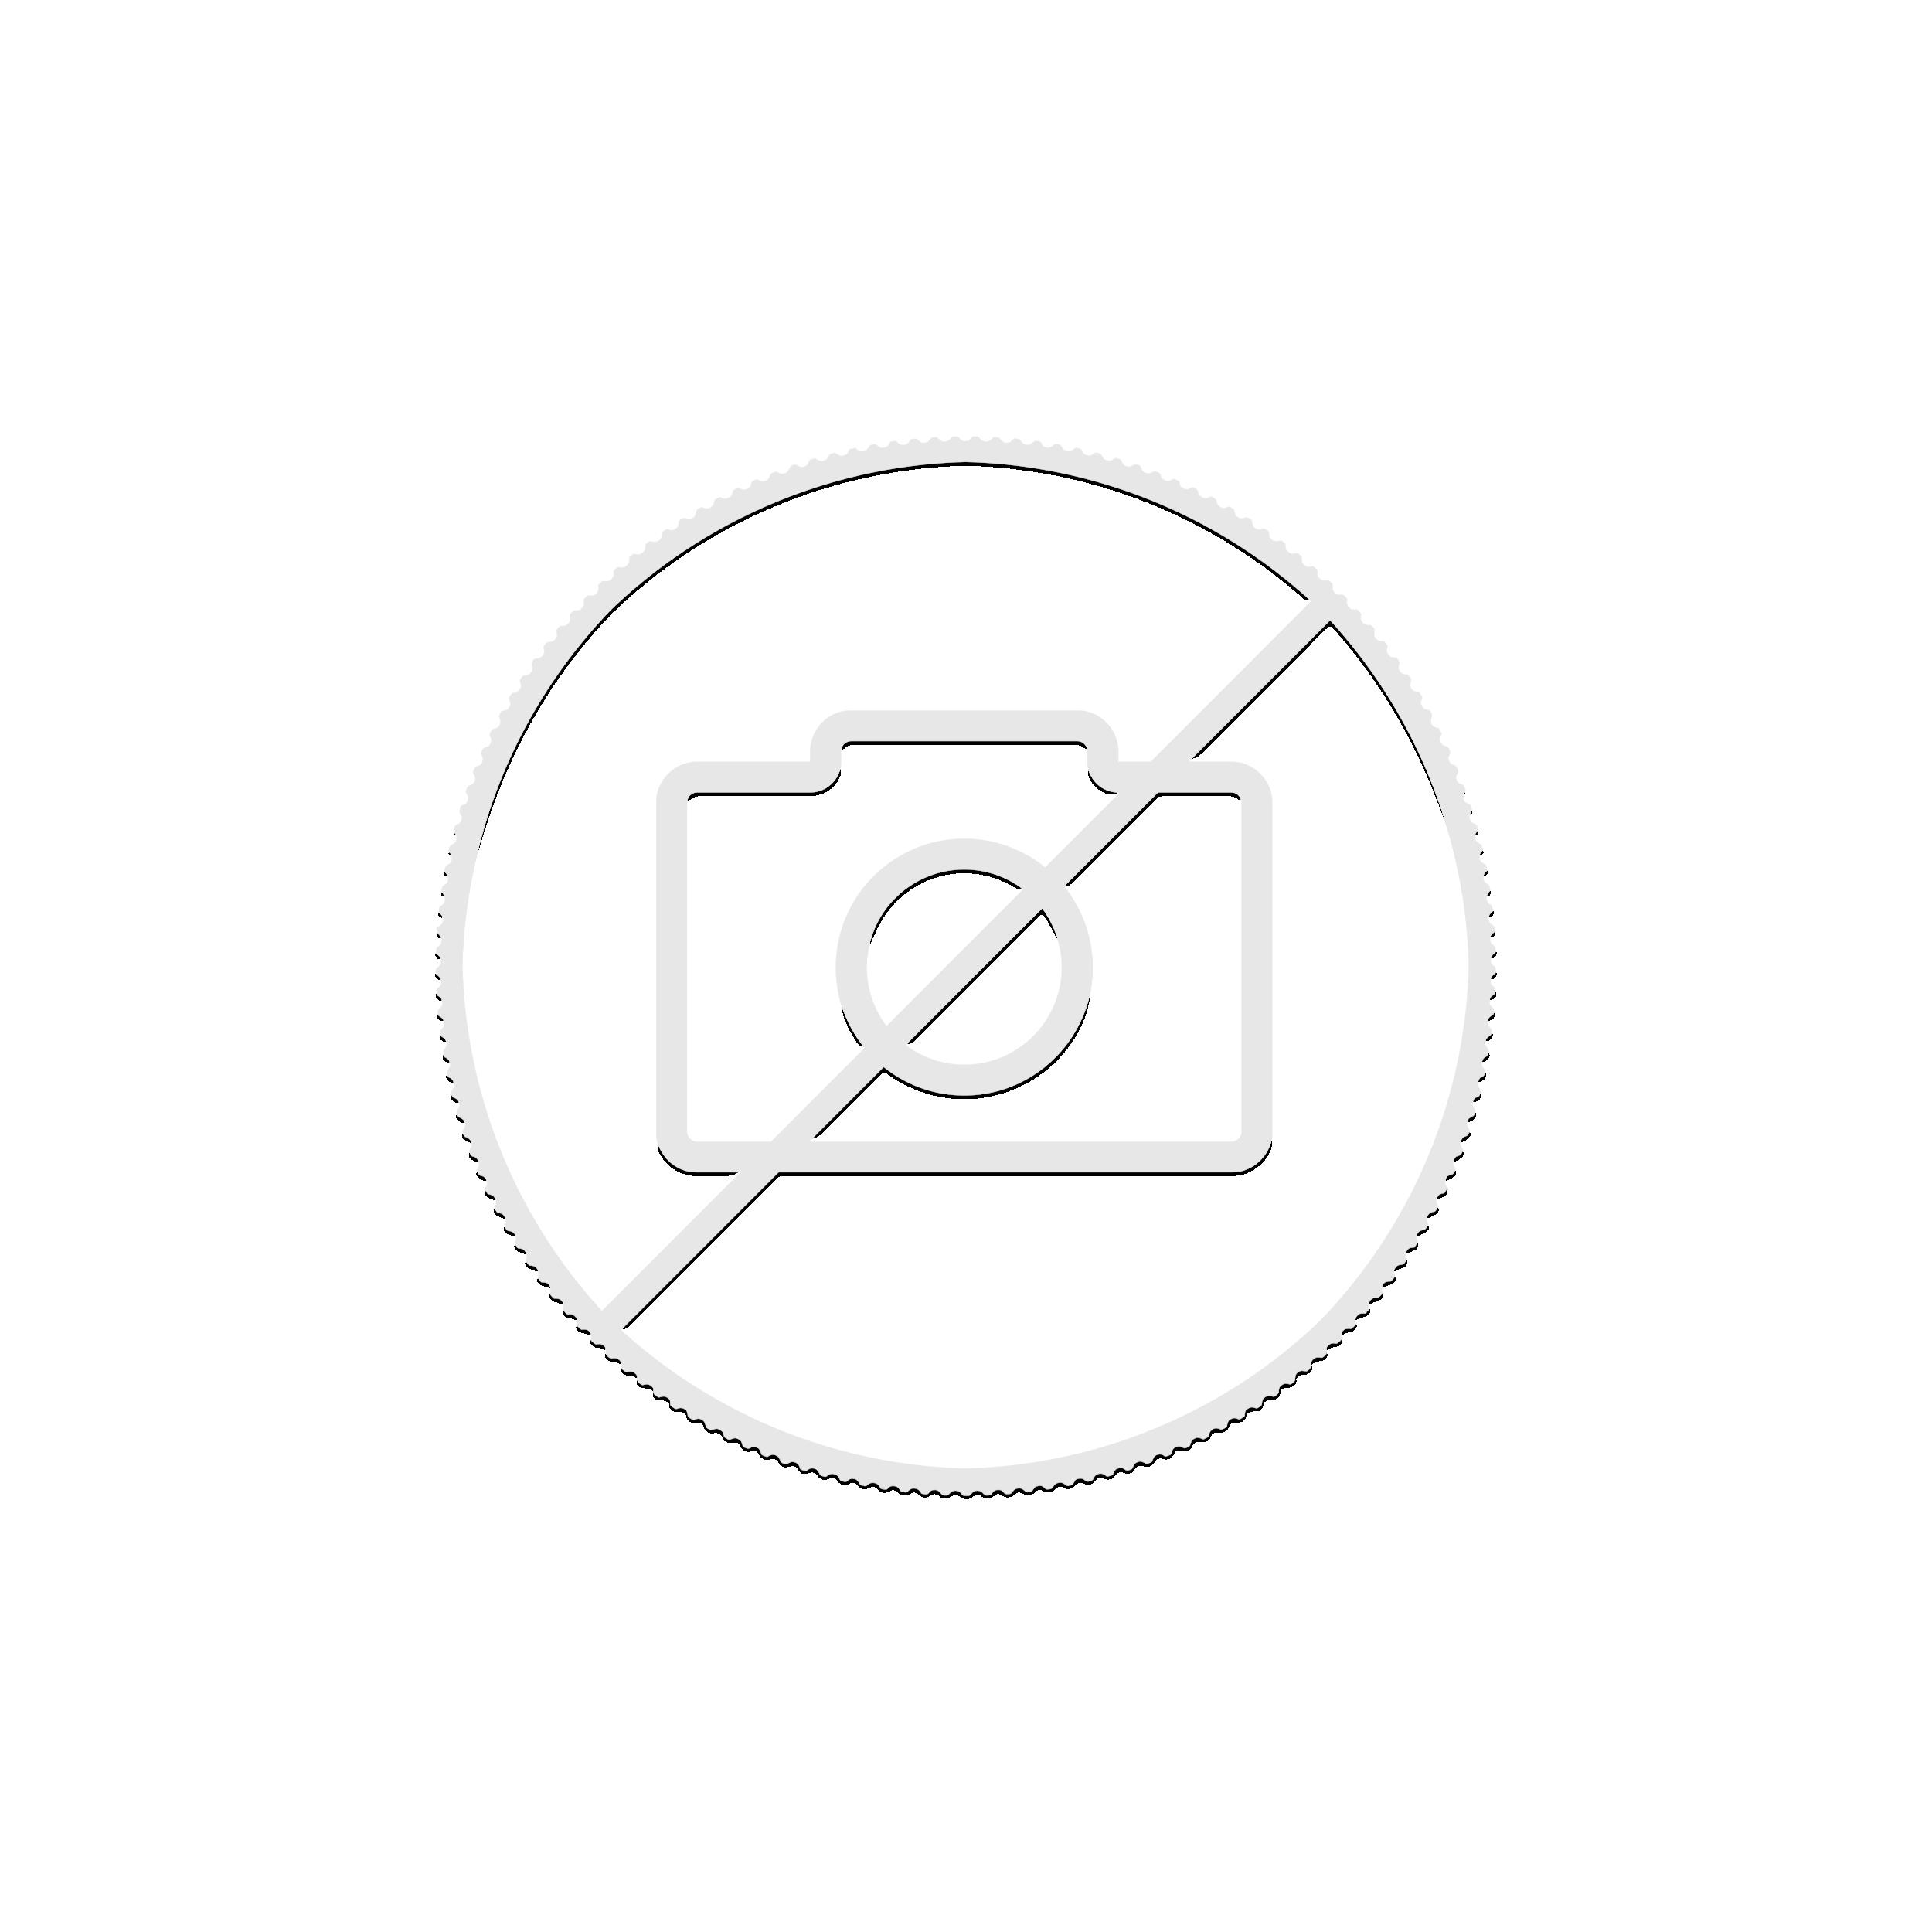 1 Troy ounce zilveren munt Krugerrand 2019